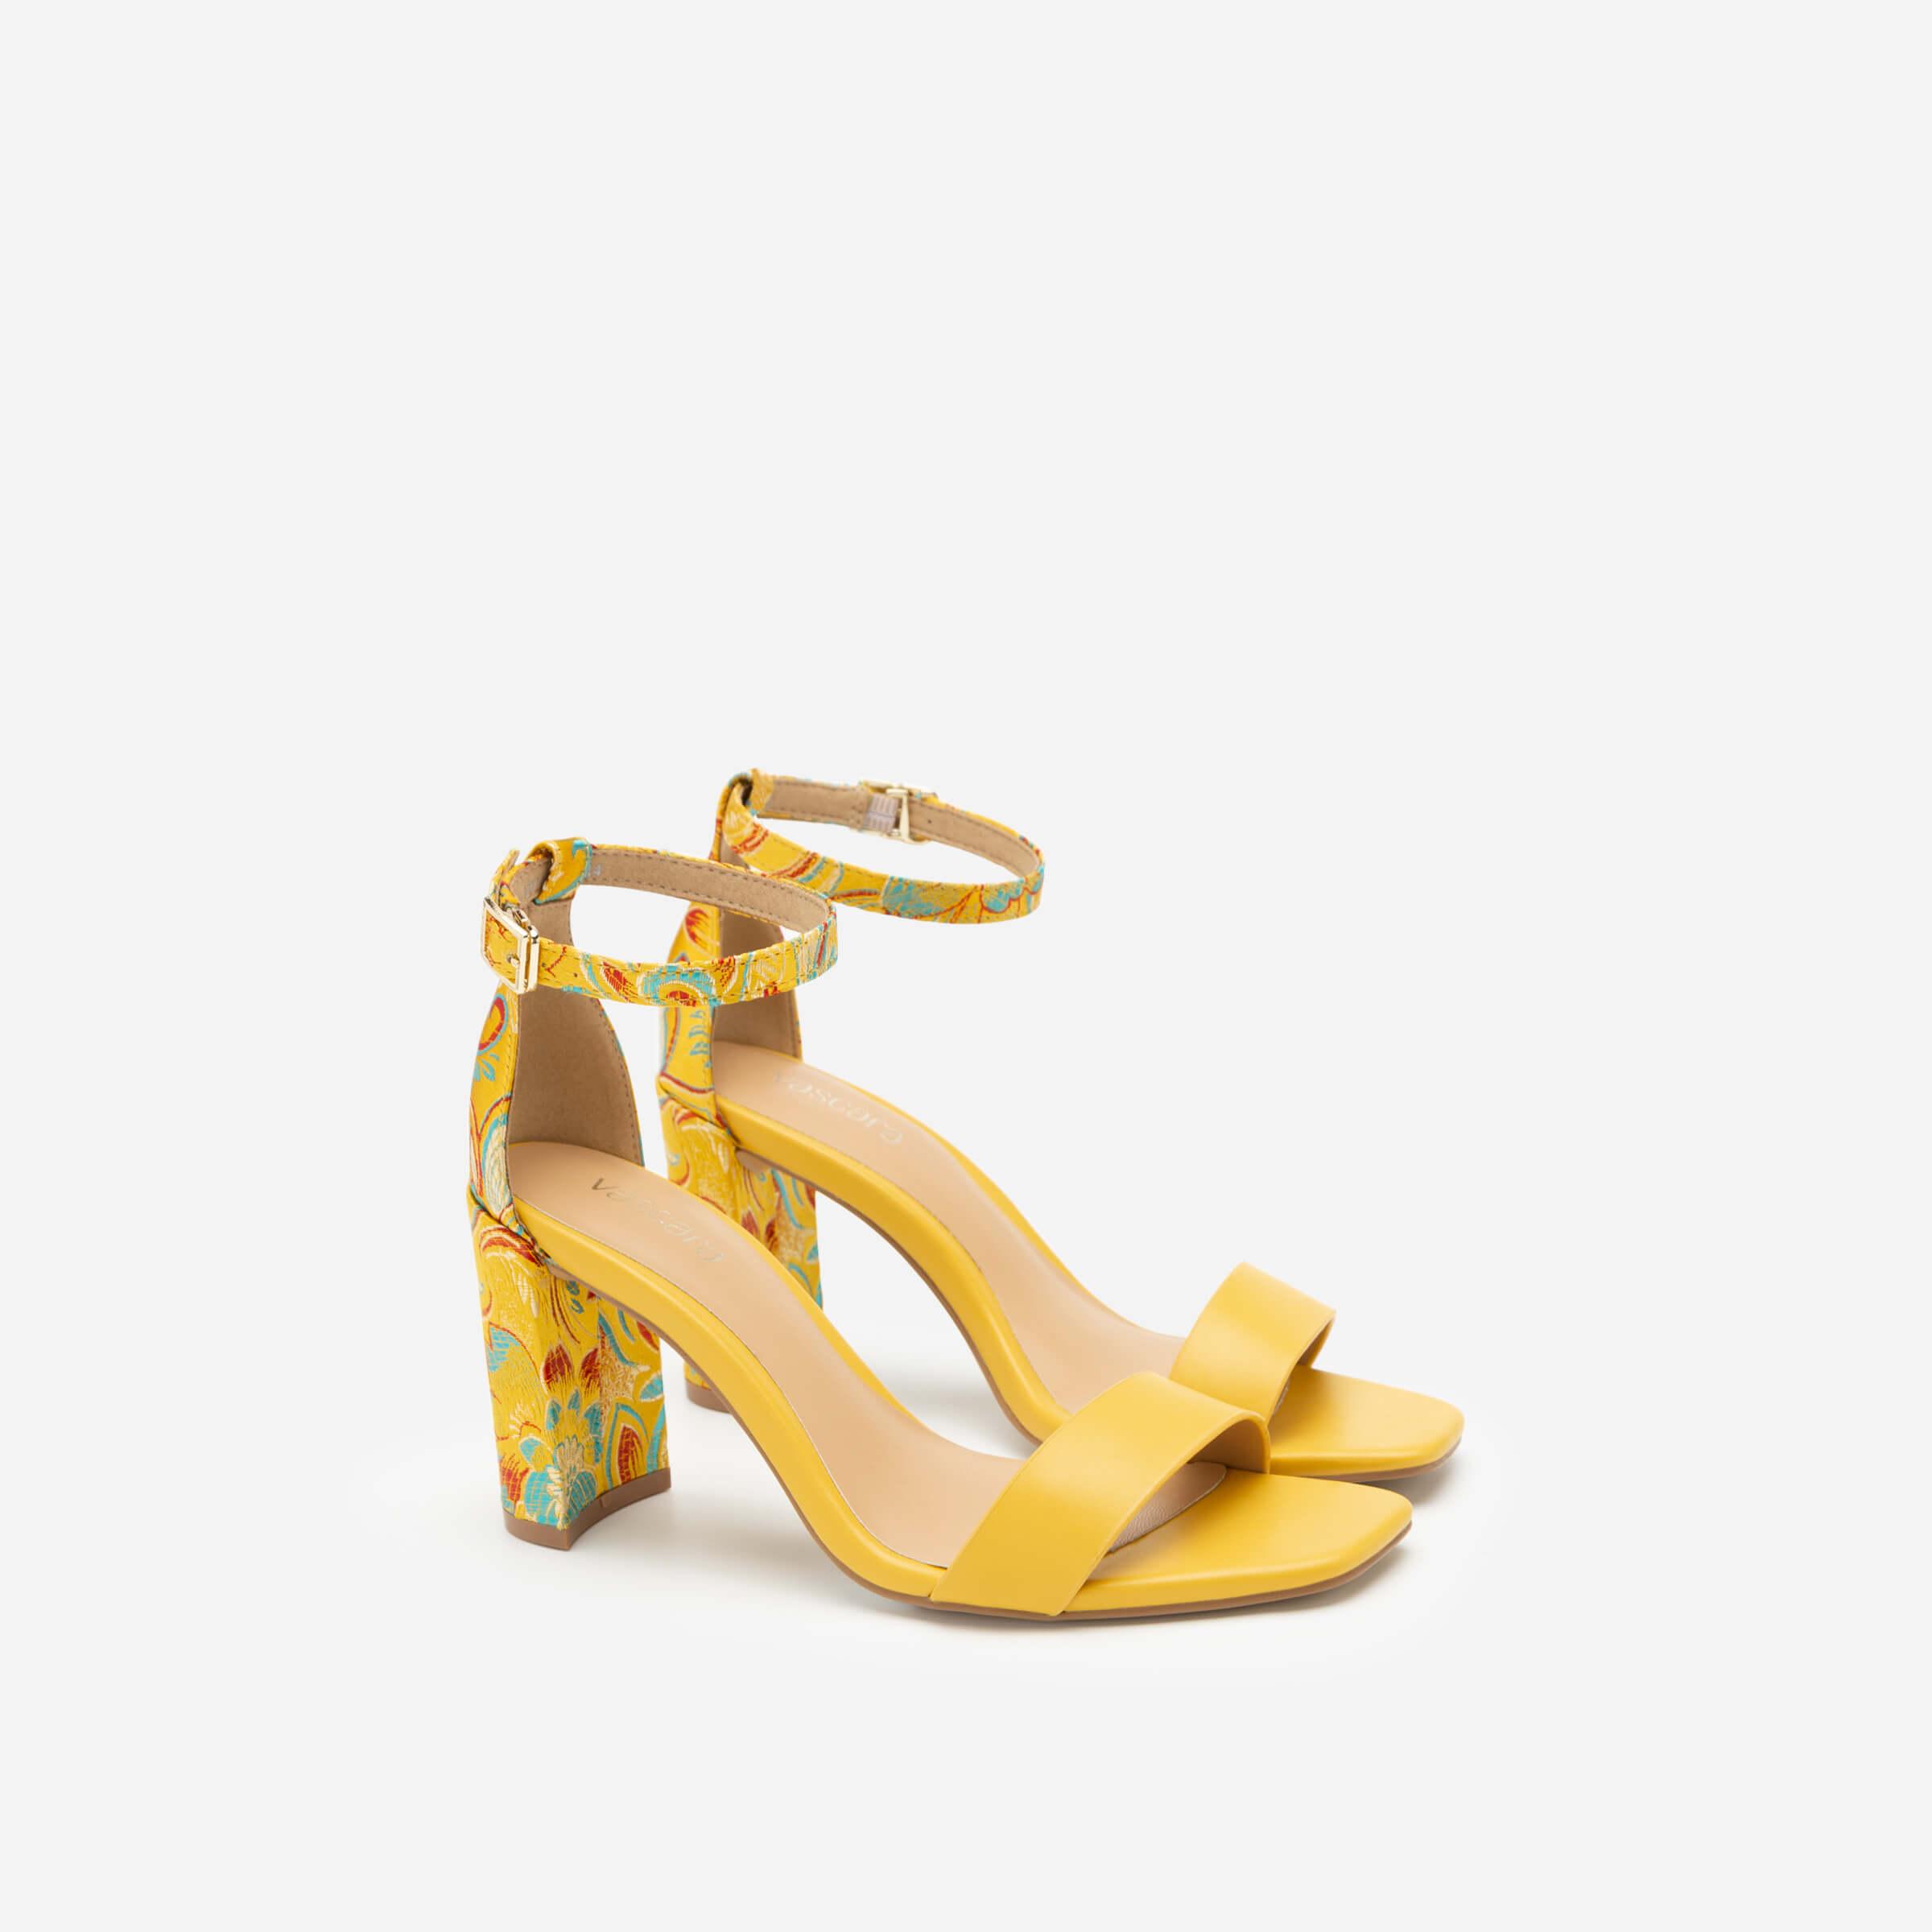 Sandals cao gót họa tiết của Vascara